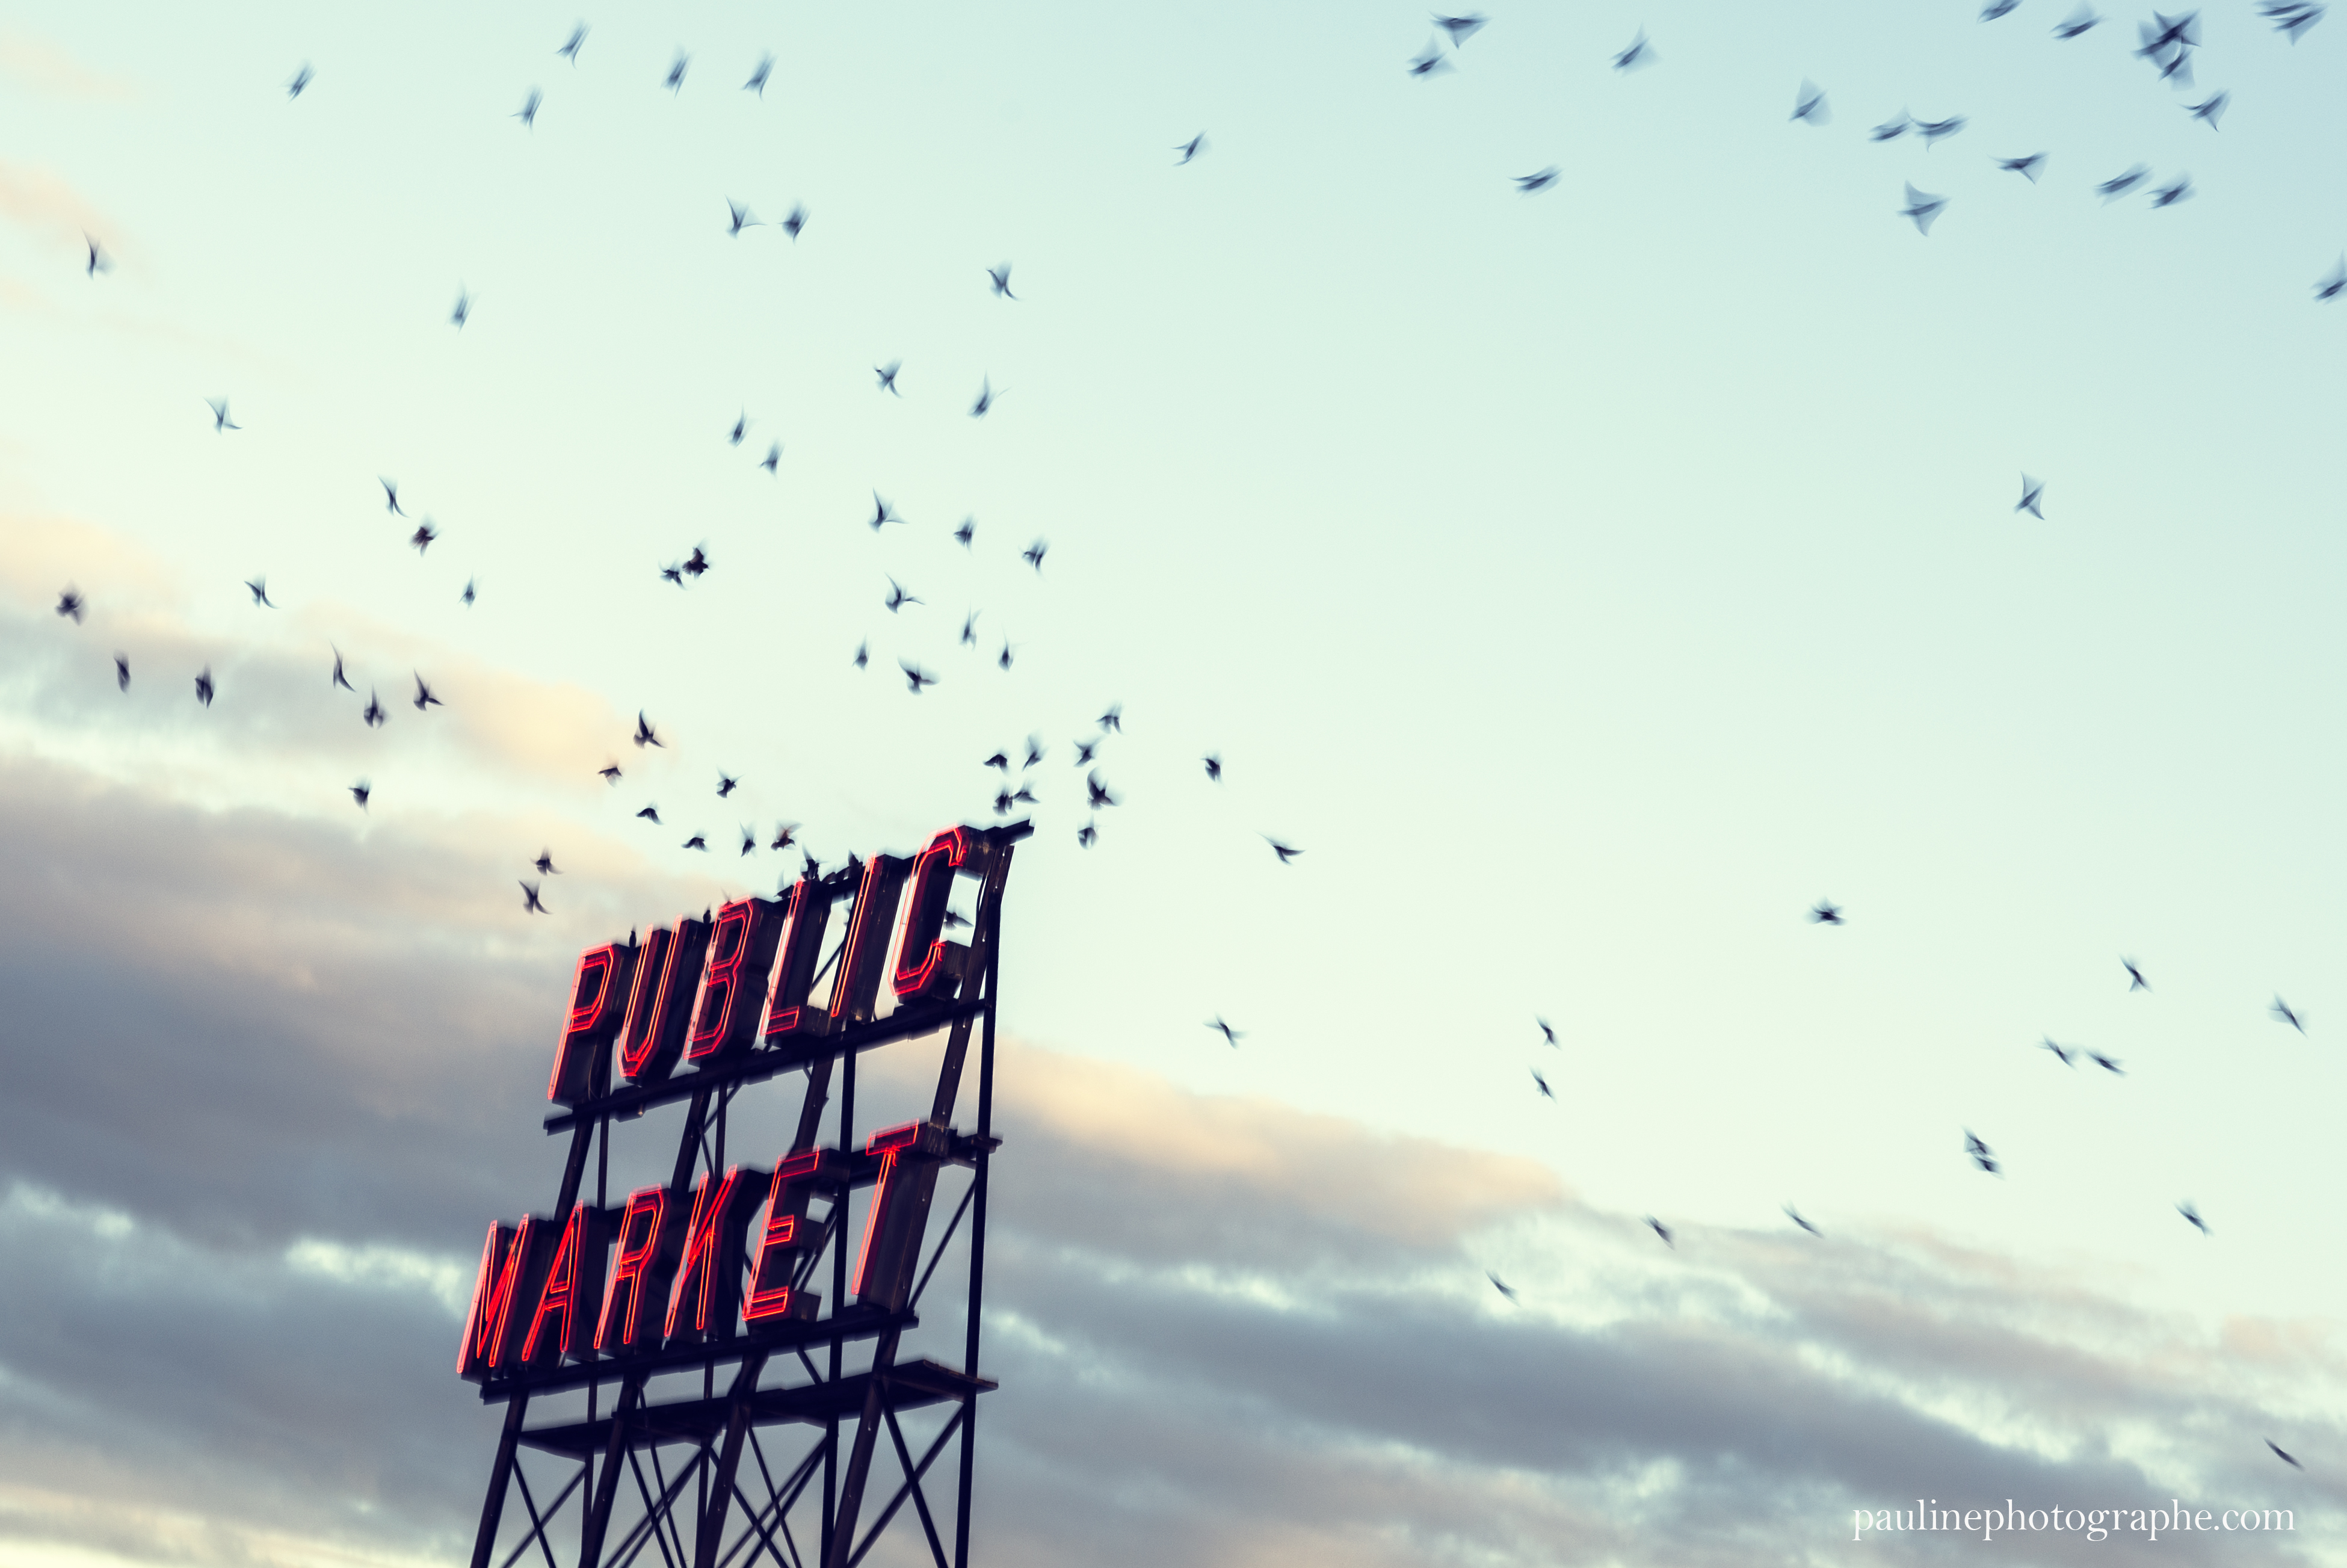 Seattle | Pauline Tezier